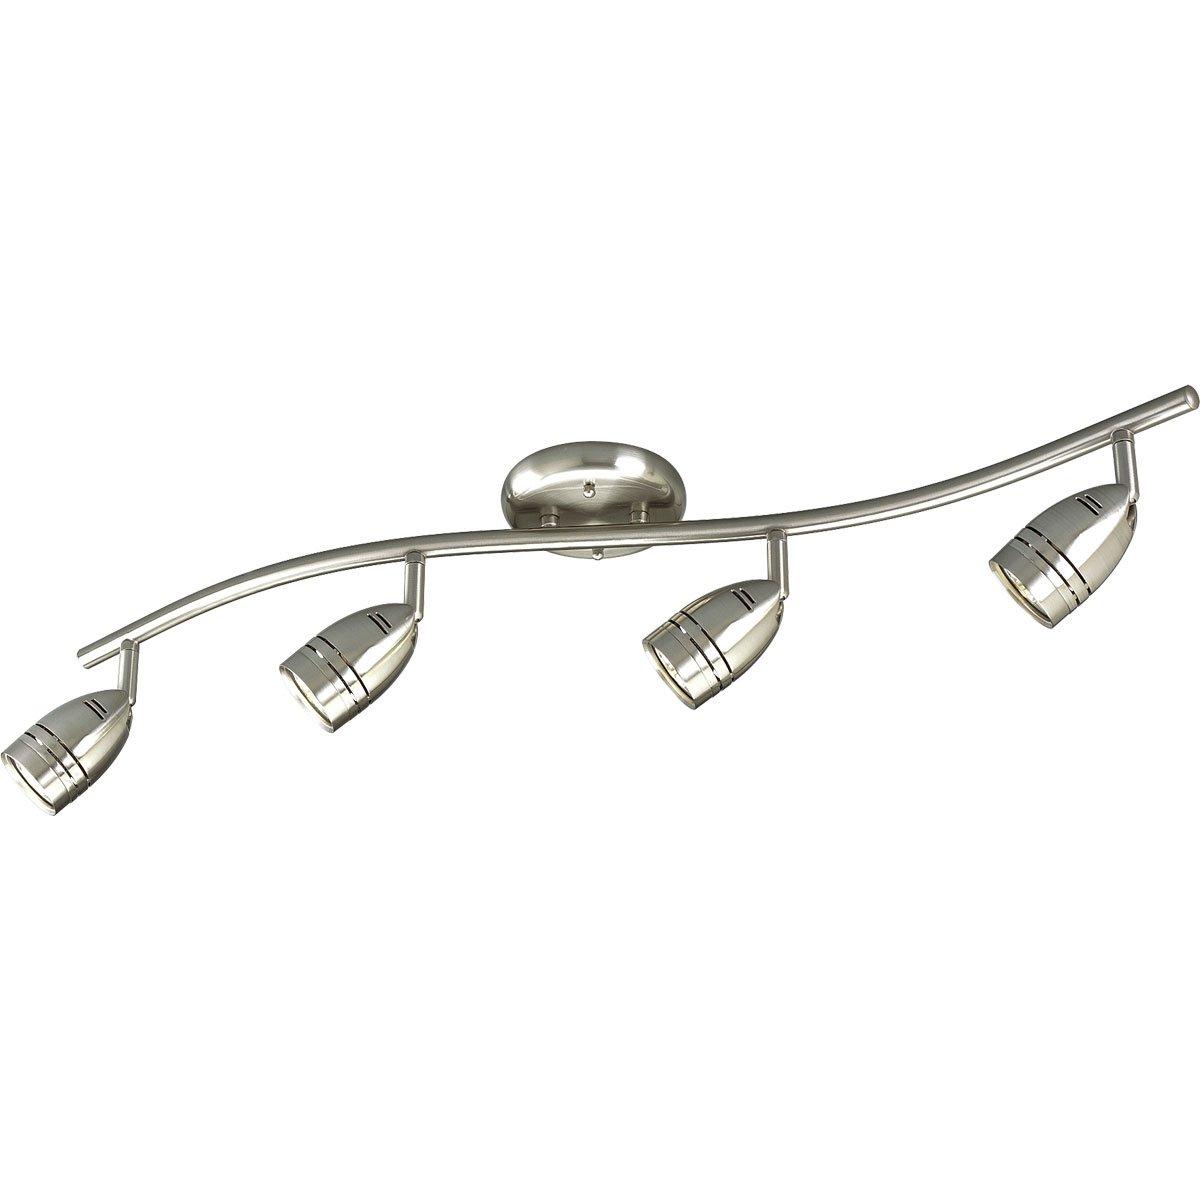 Progress Lighting P6163-09WB 4-Light Wavy Wall/Ceiling Mount Directional, Brushed Nickel by Progress Lighting